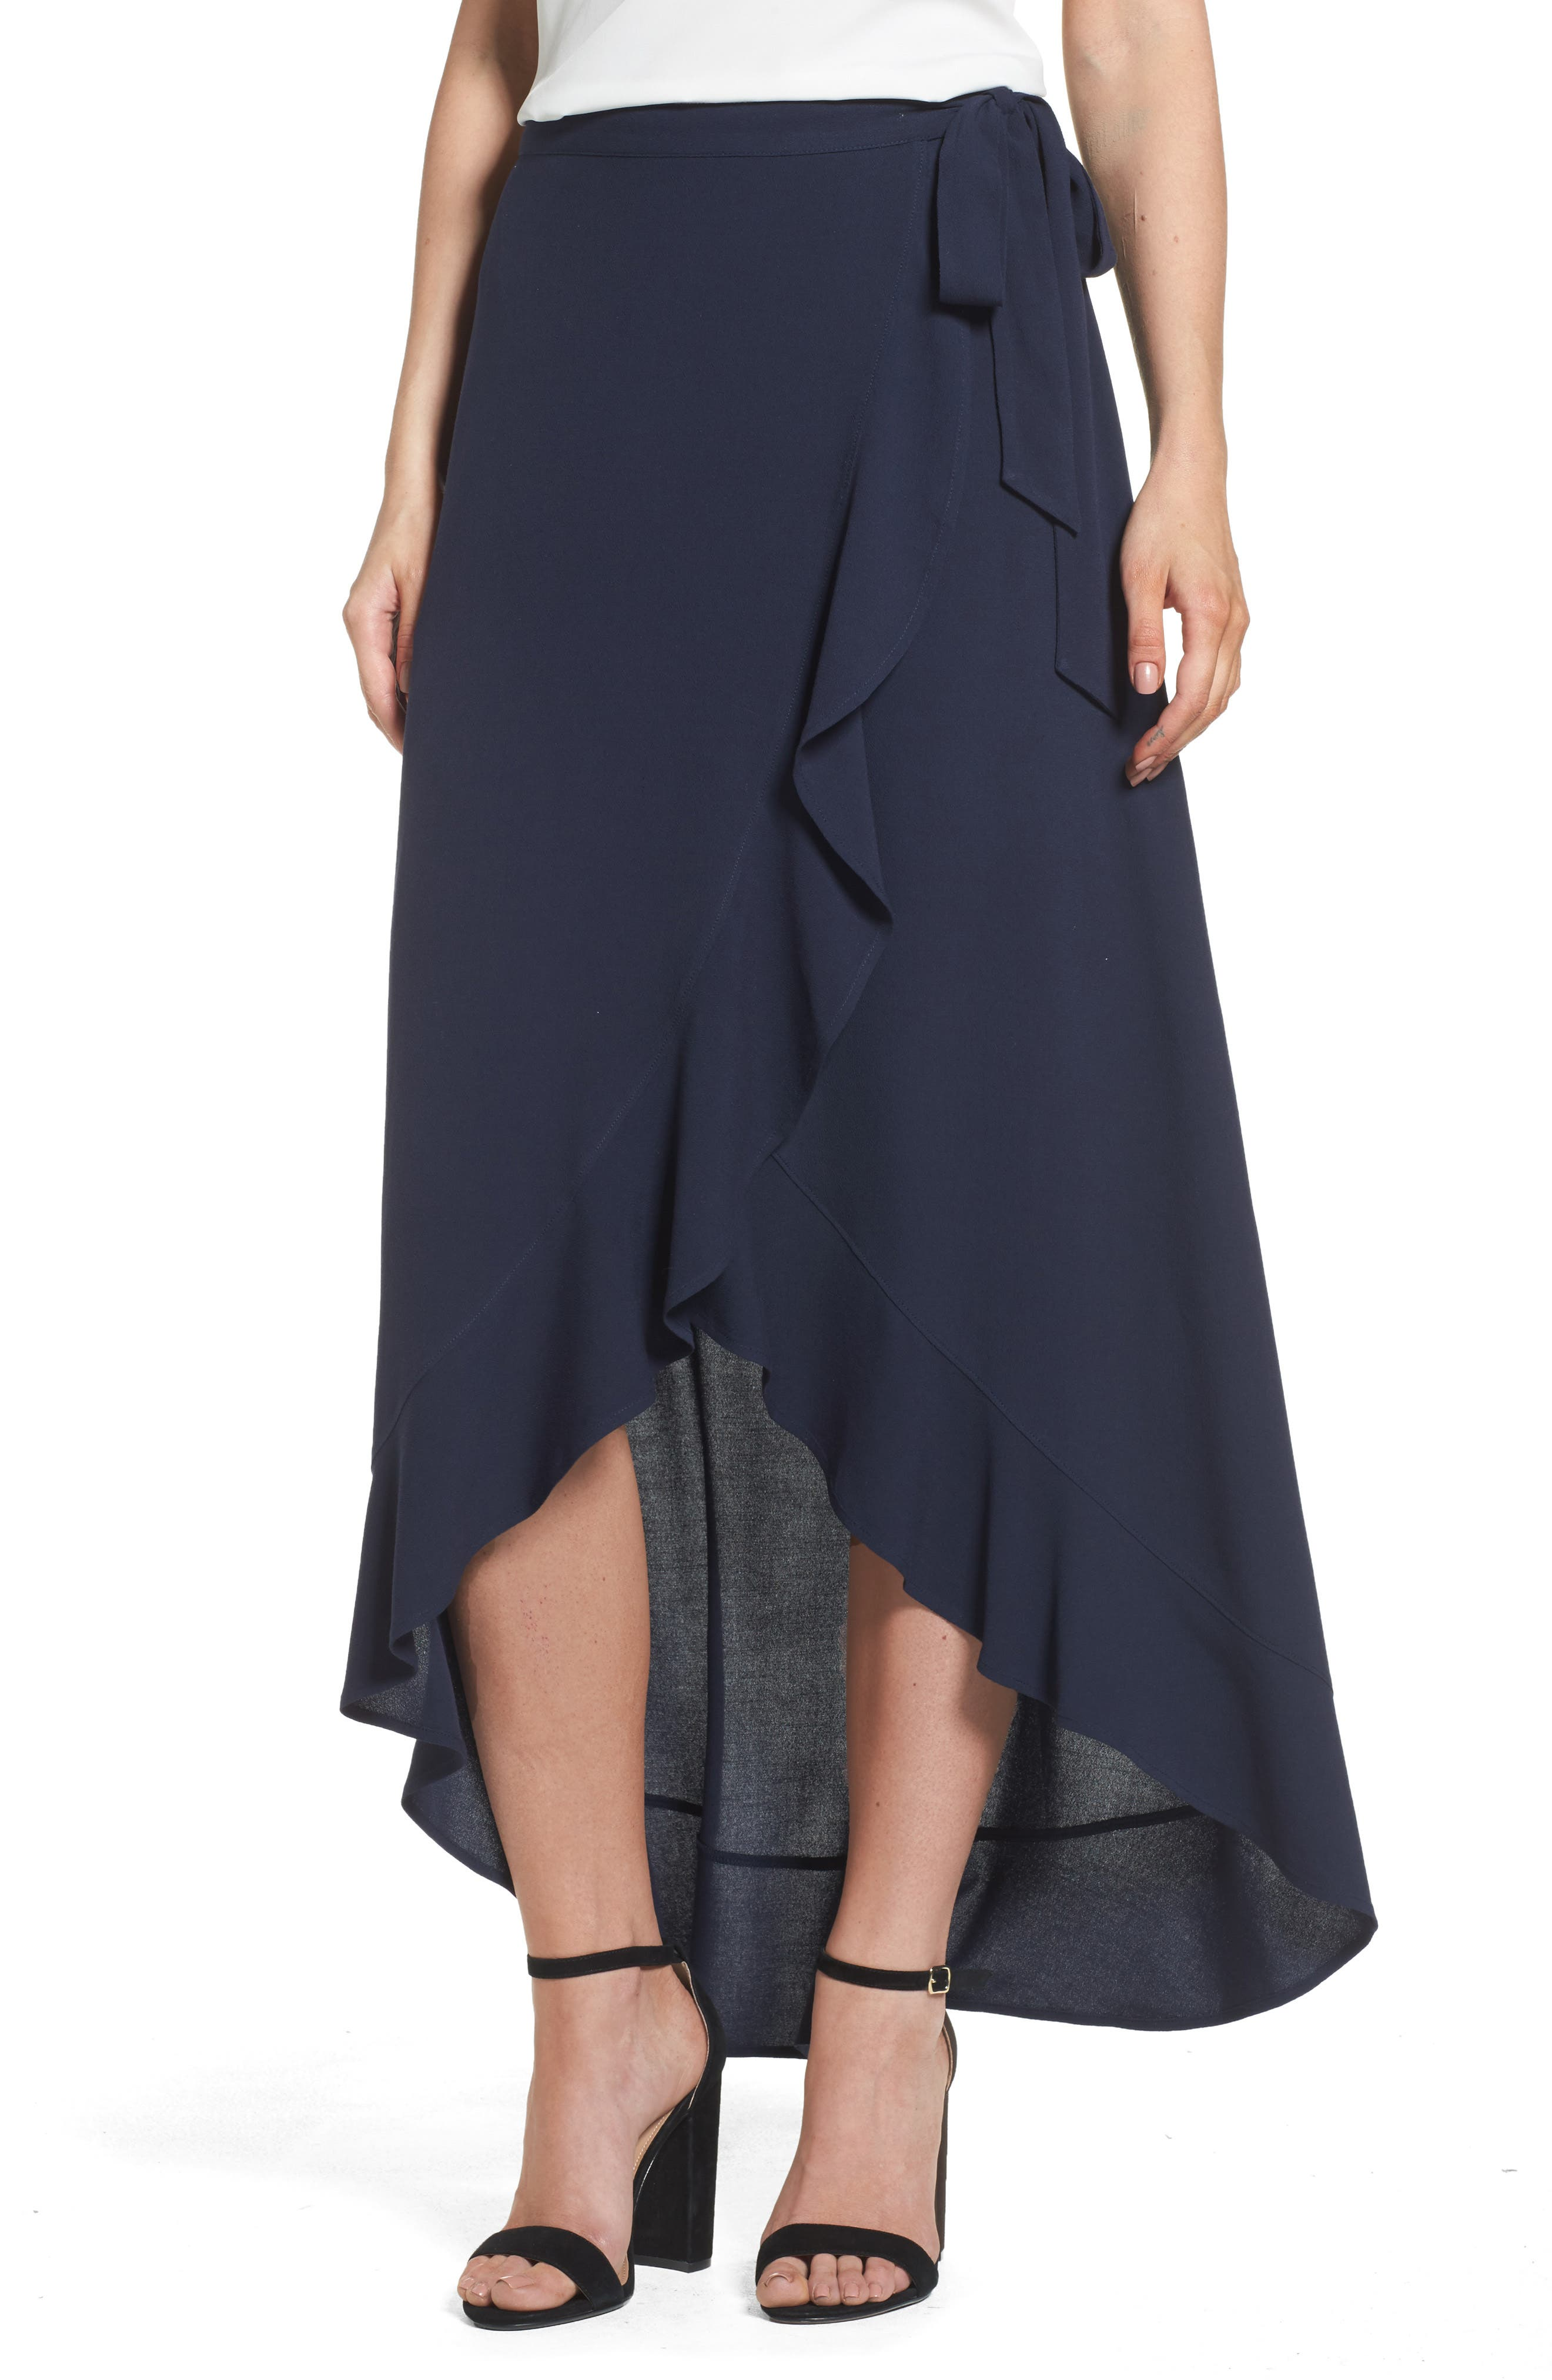 CHELSEA28 Ruffle Wrap Skirt